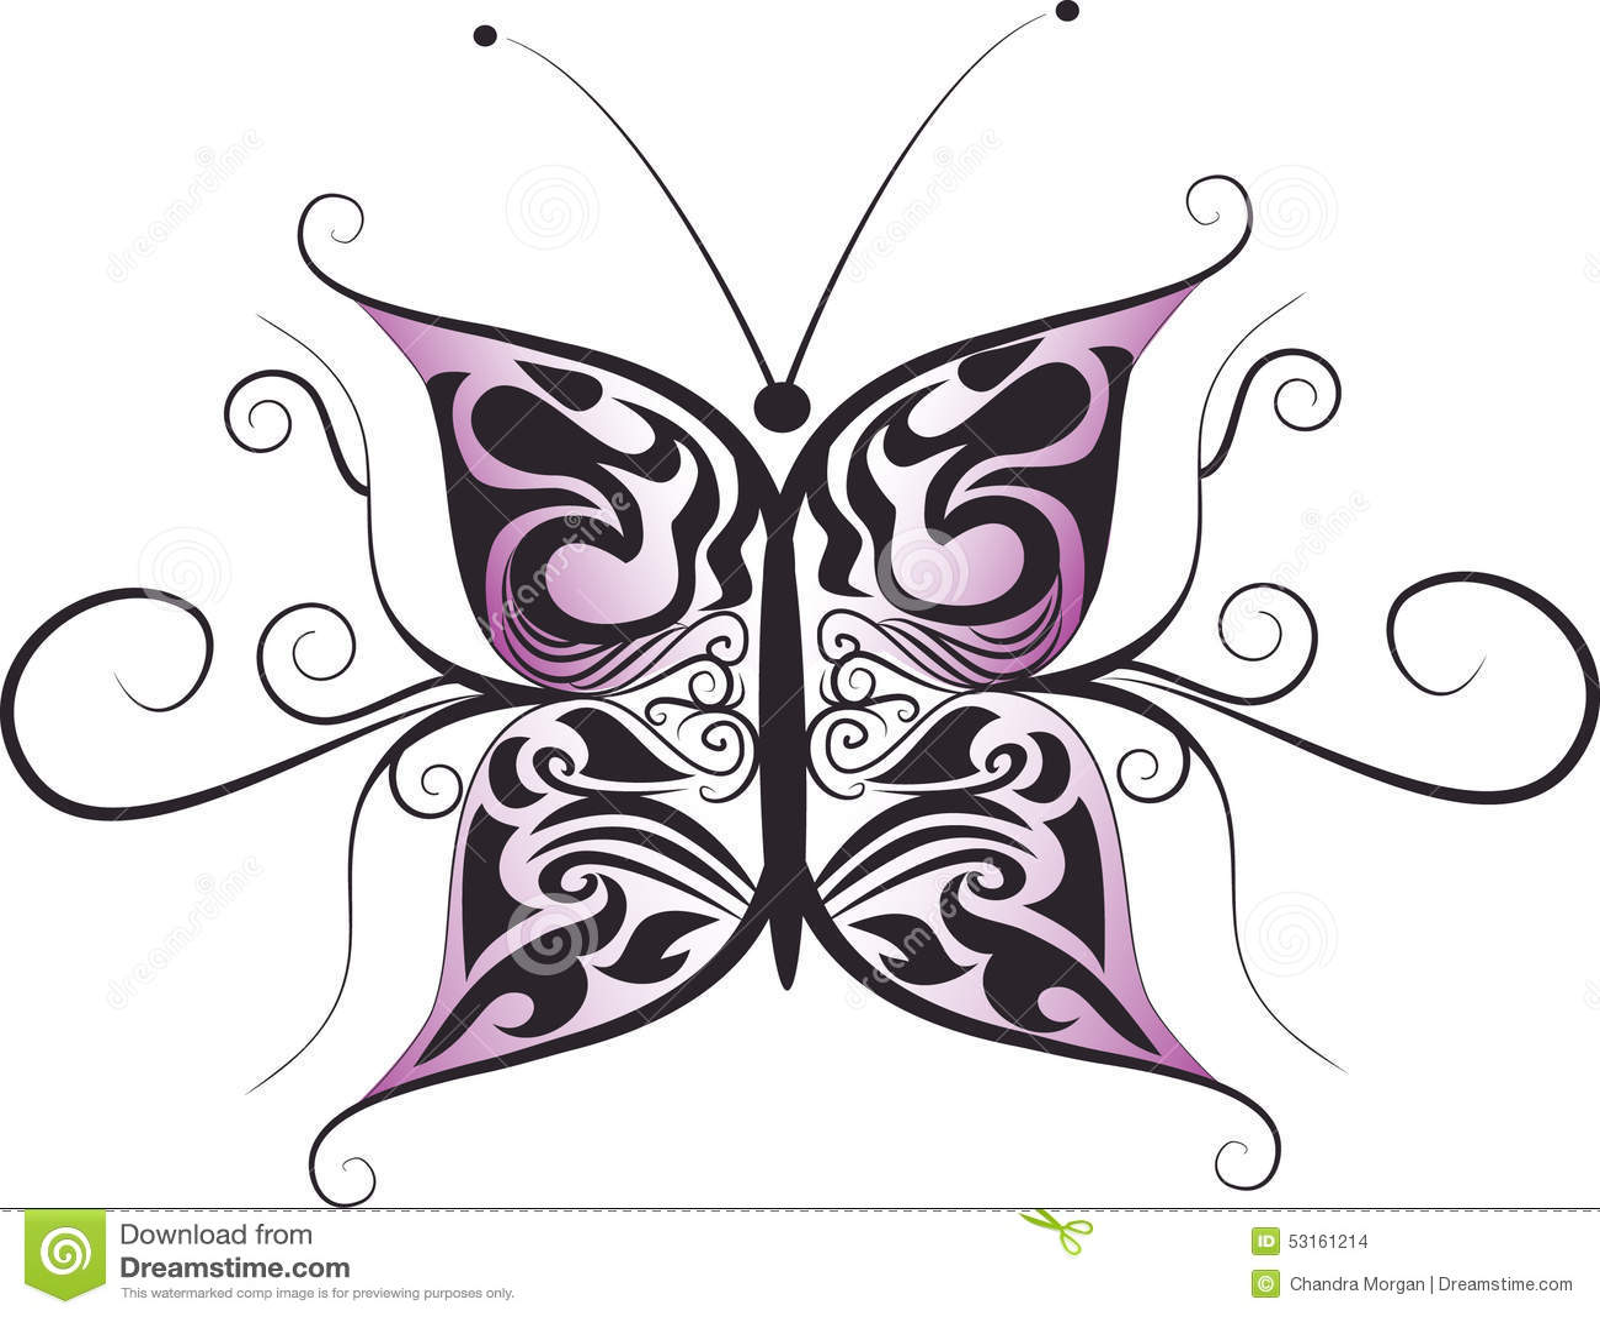 Butterfly logo design stock illustration image 53161214 for Tattoo style logo design